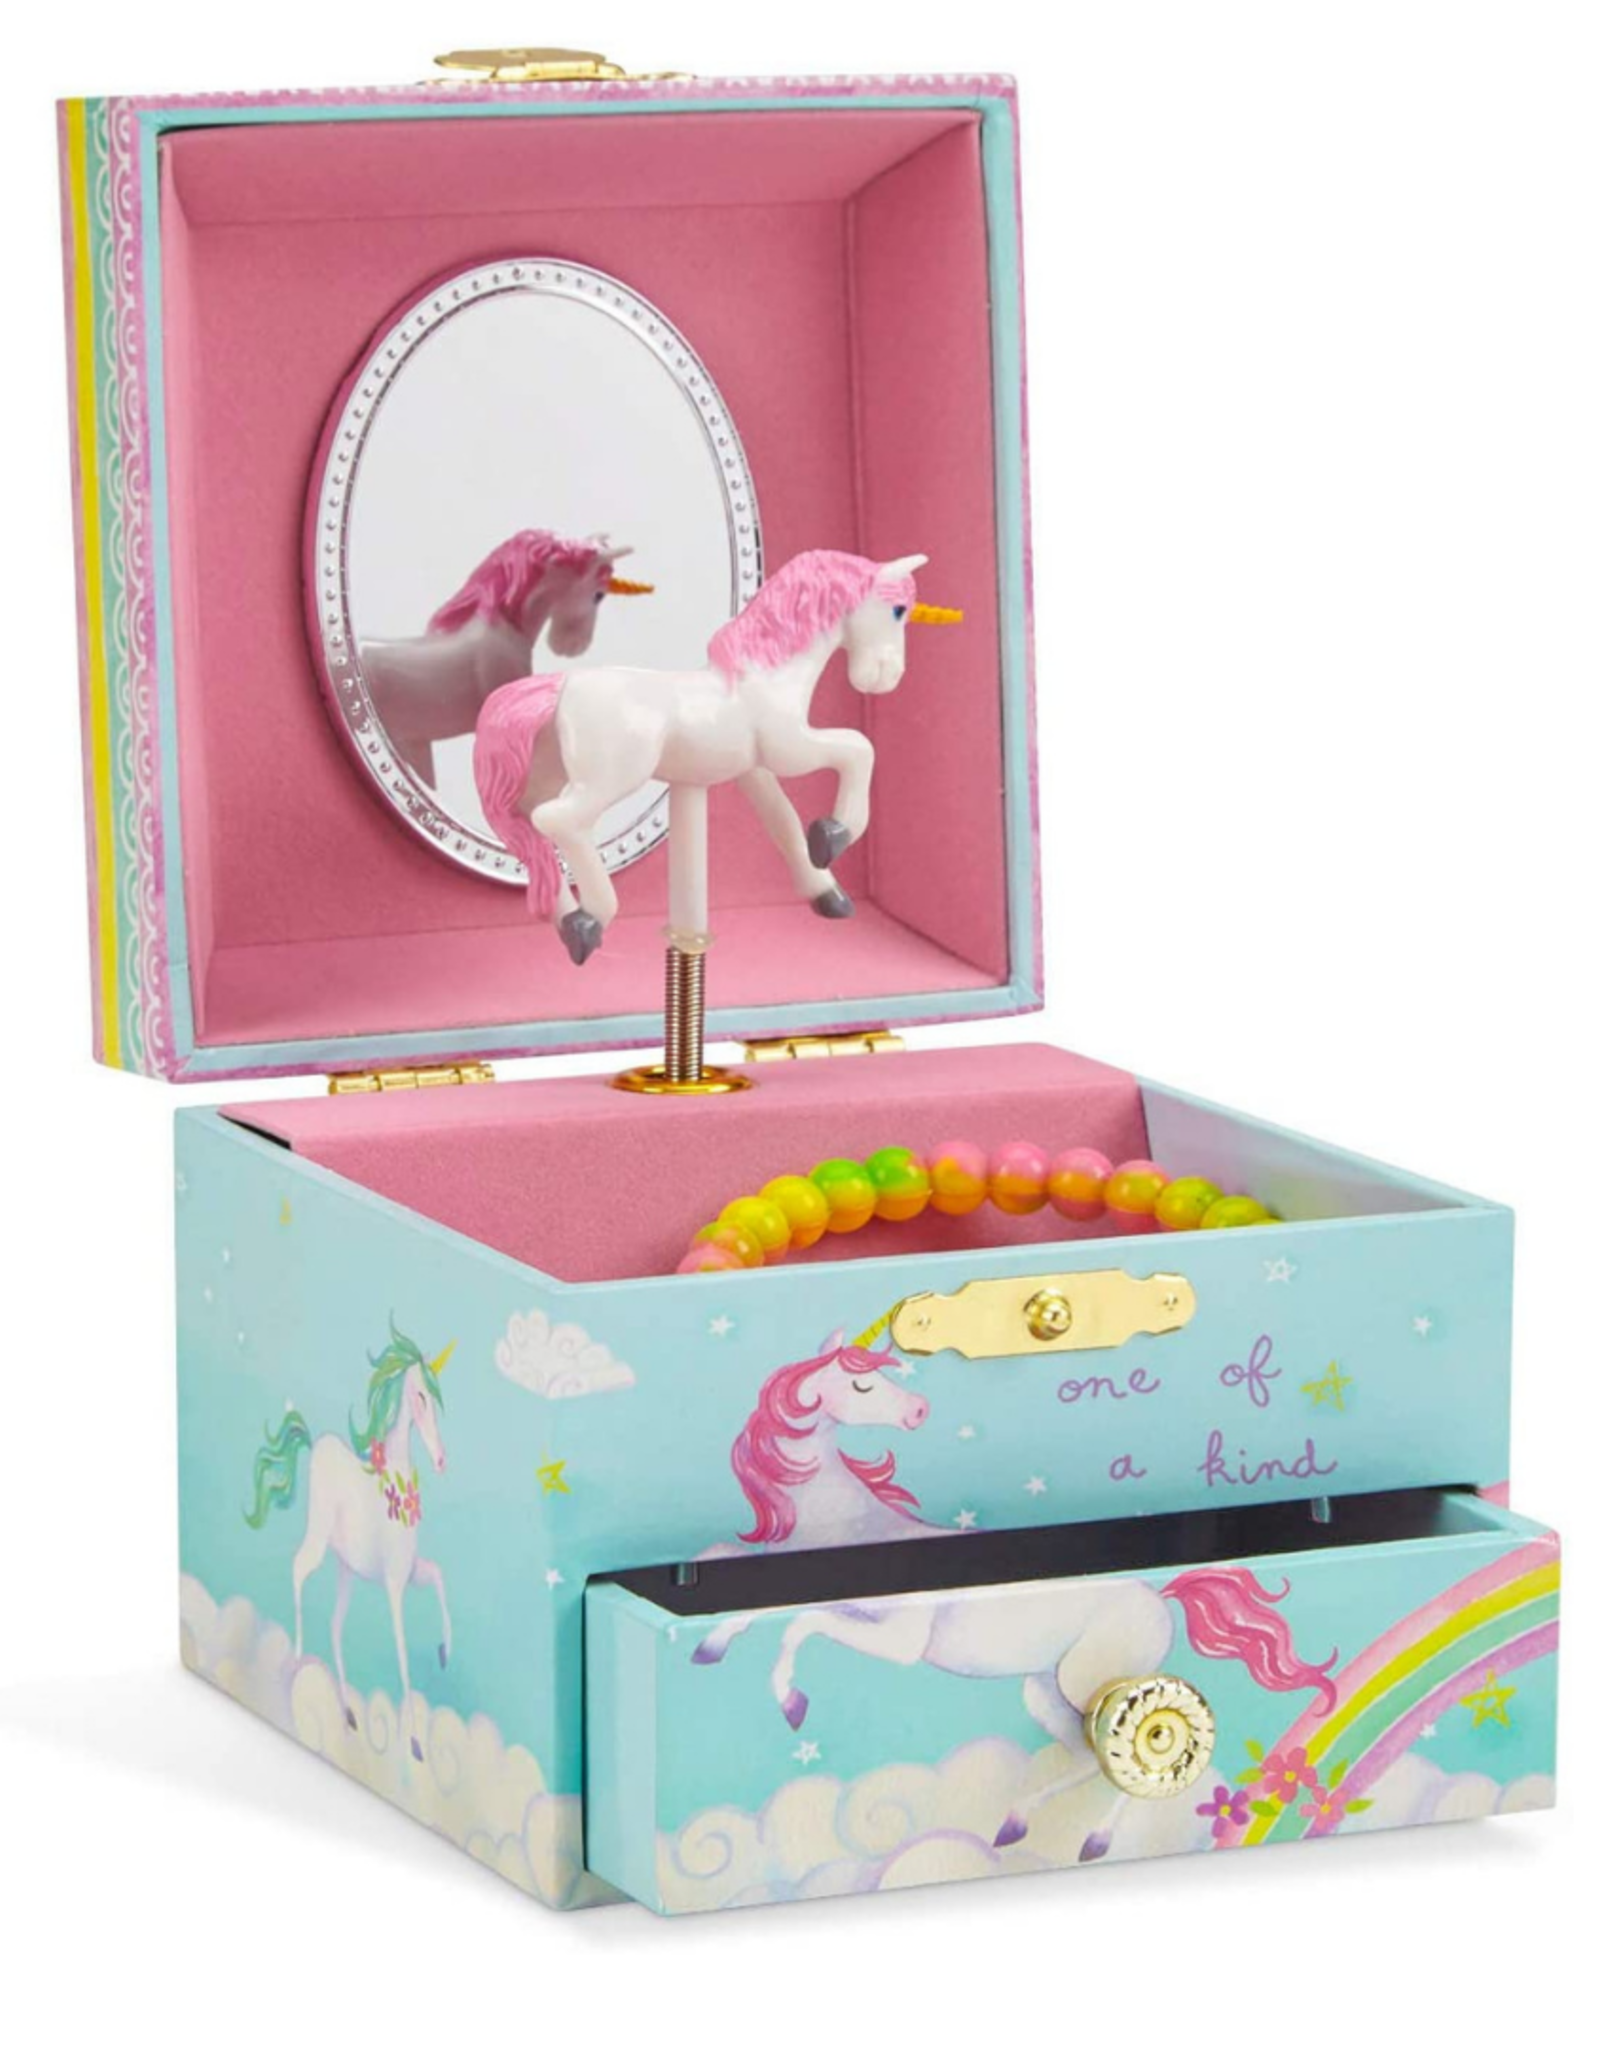 Jewelkeeper Musical Jewelry Box Unicorn